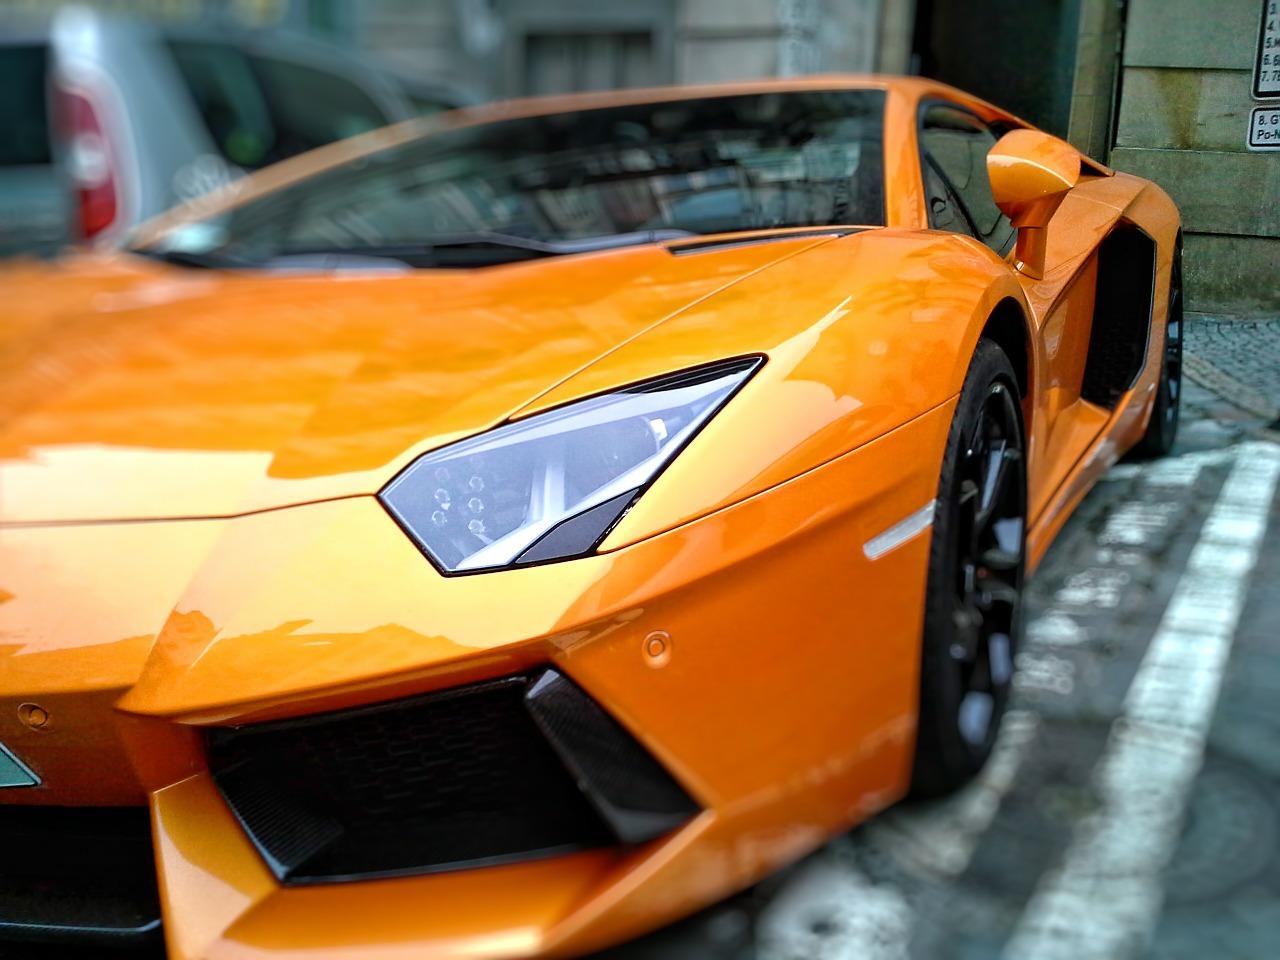 Půjčka na auto – na co si dát pozor?